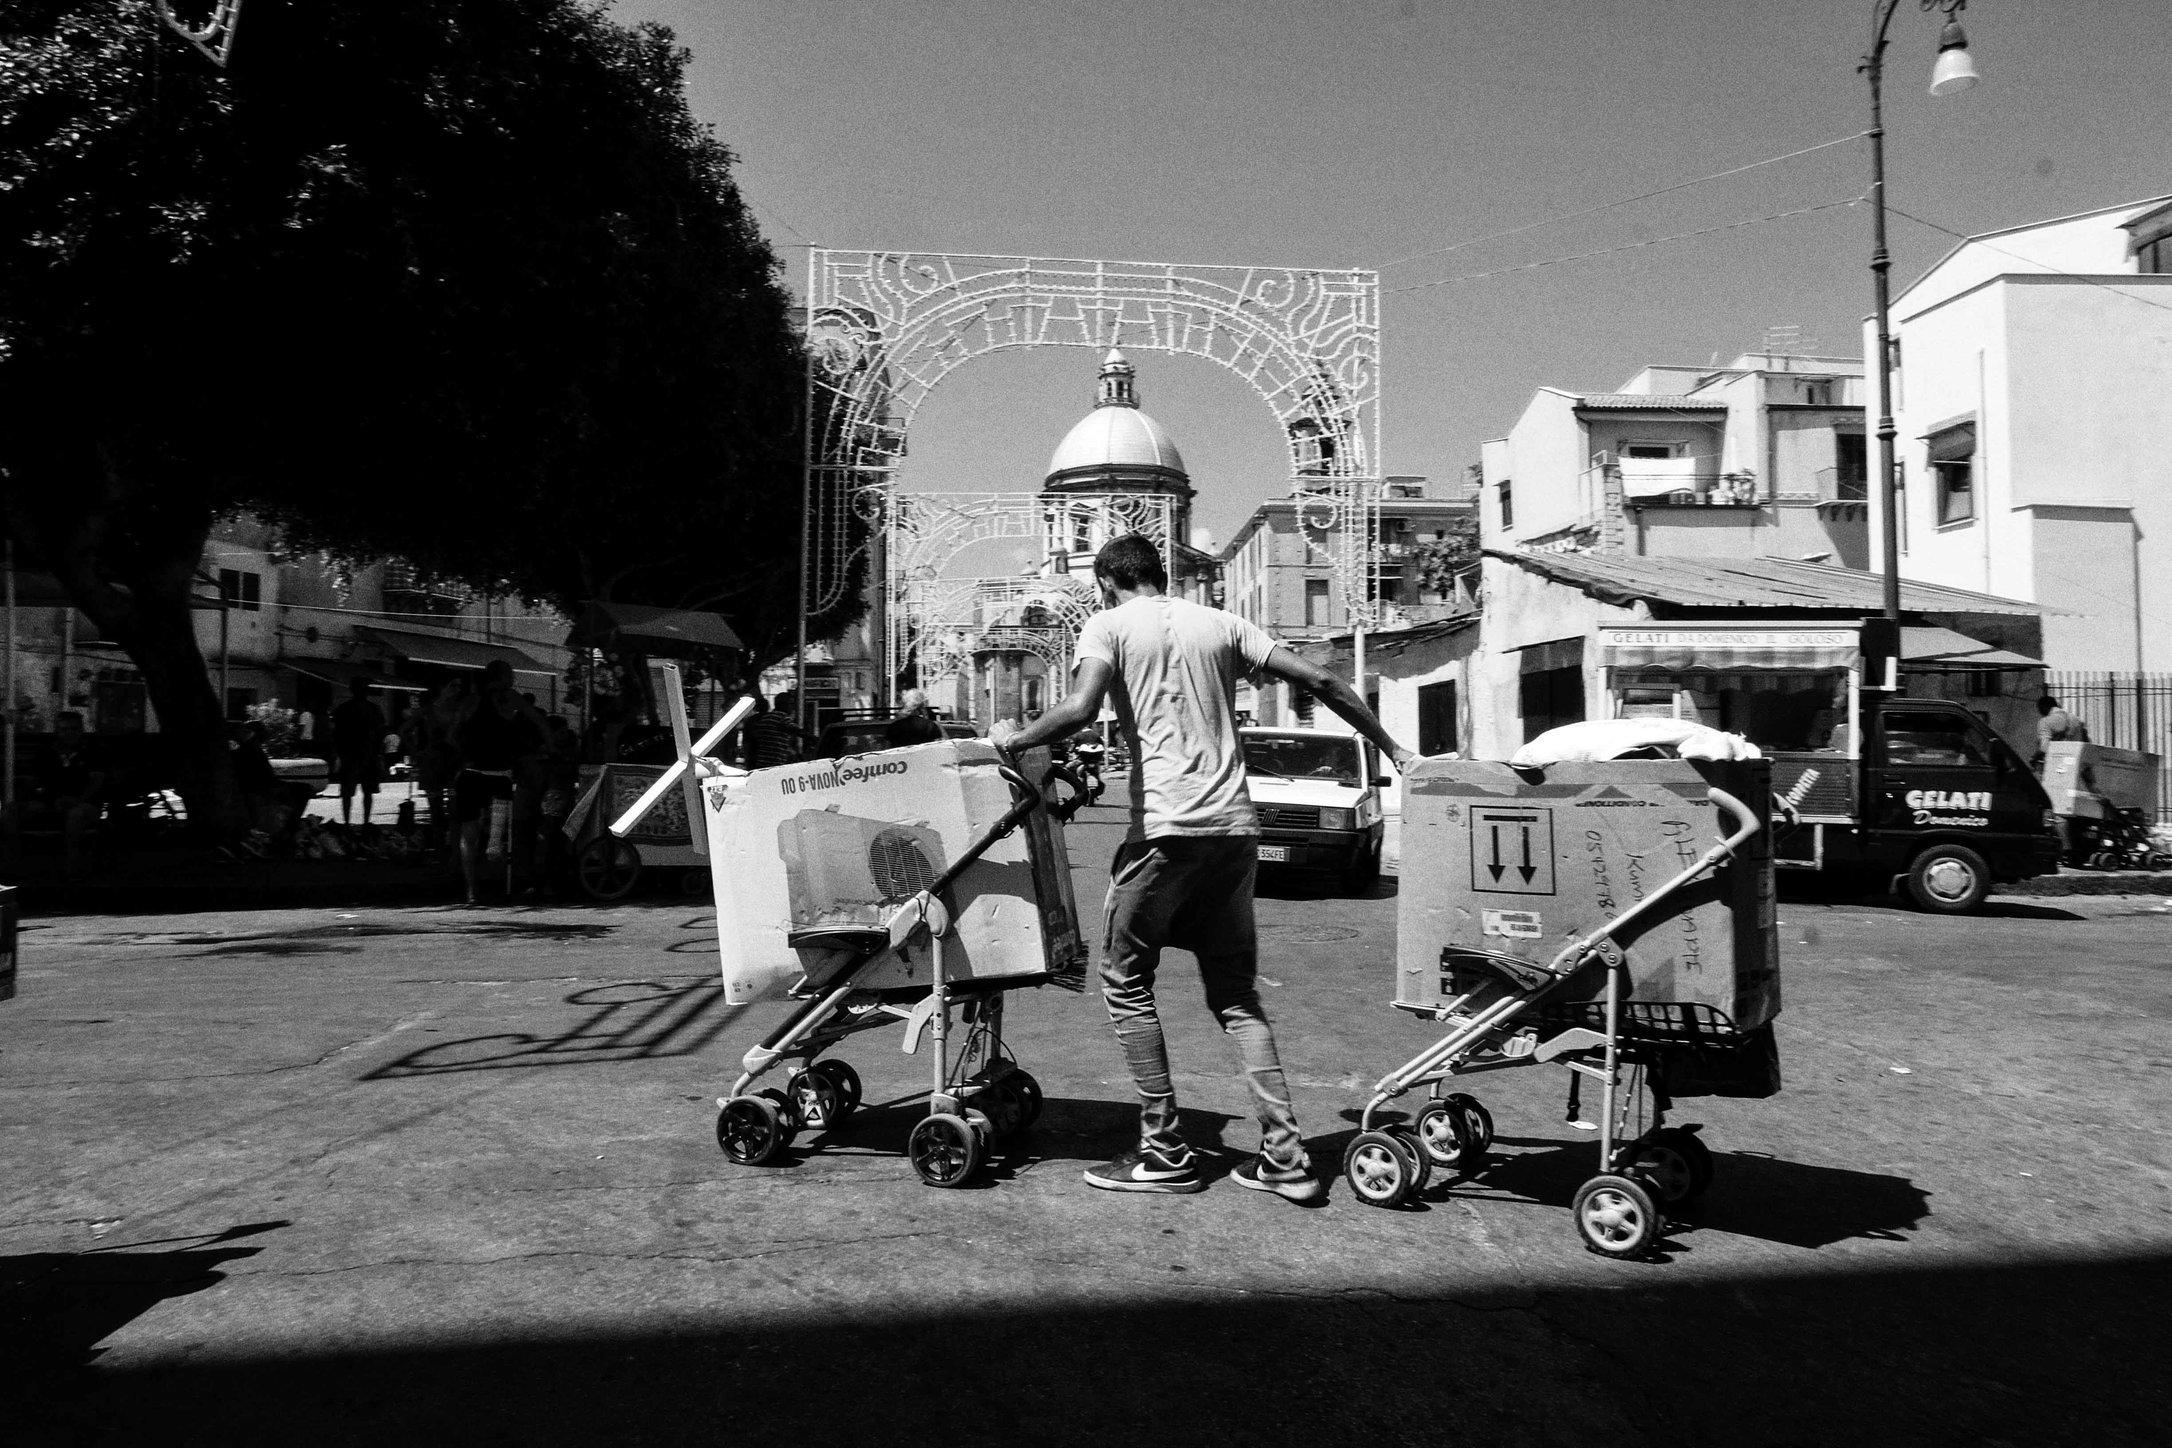 myownlens_streetphotography_palermo__chimenti_19.jpg